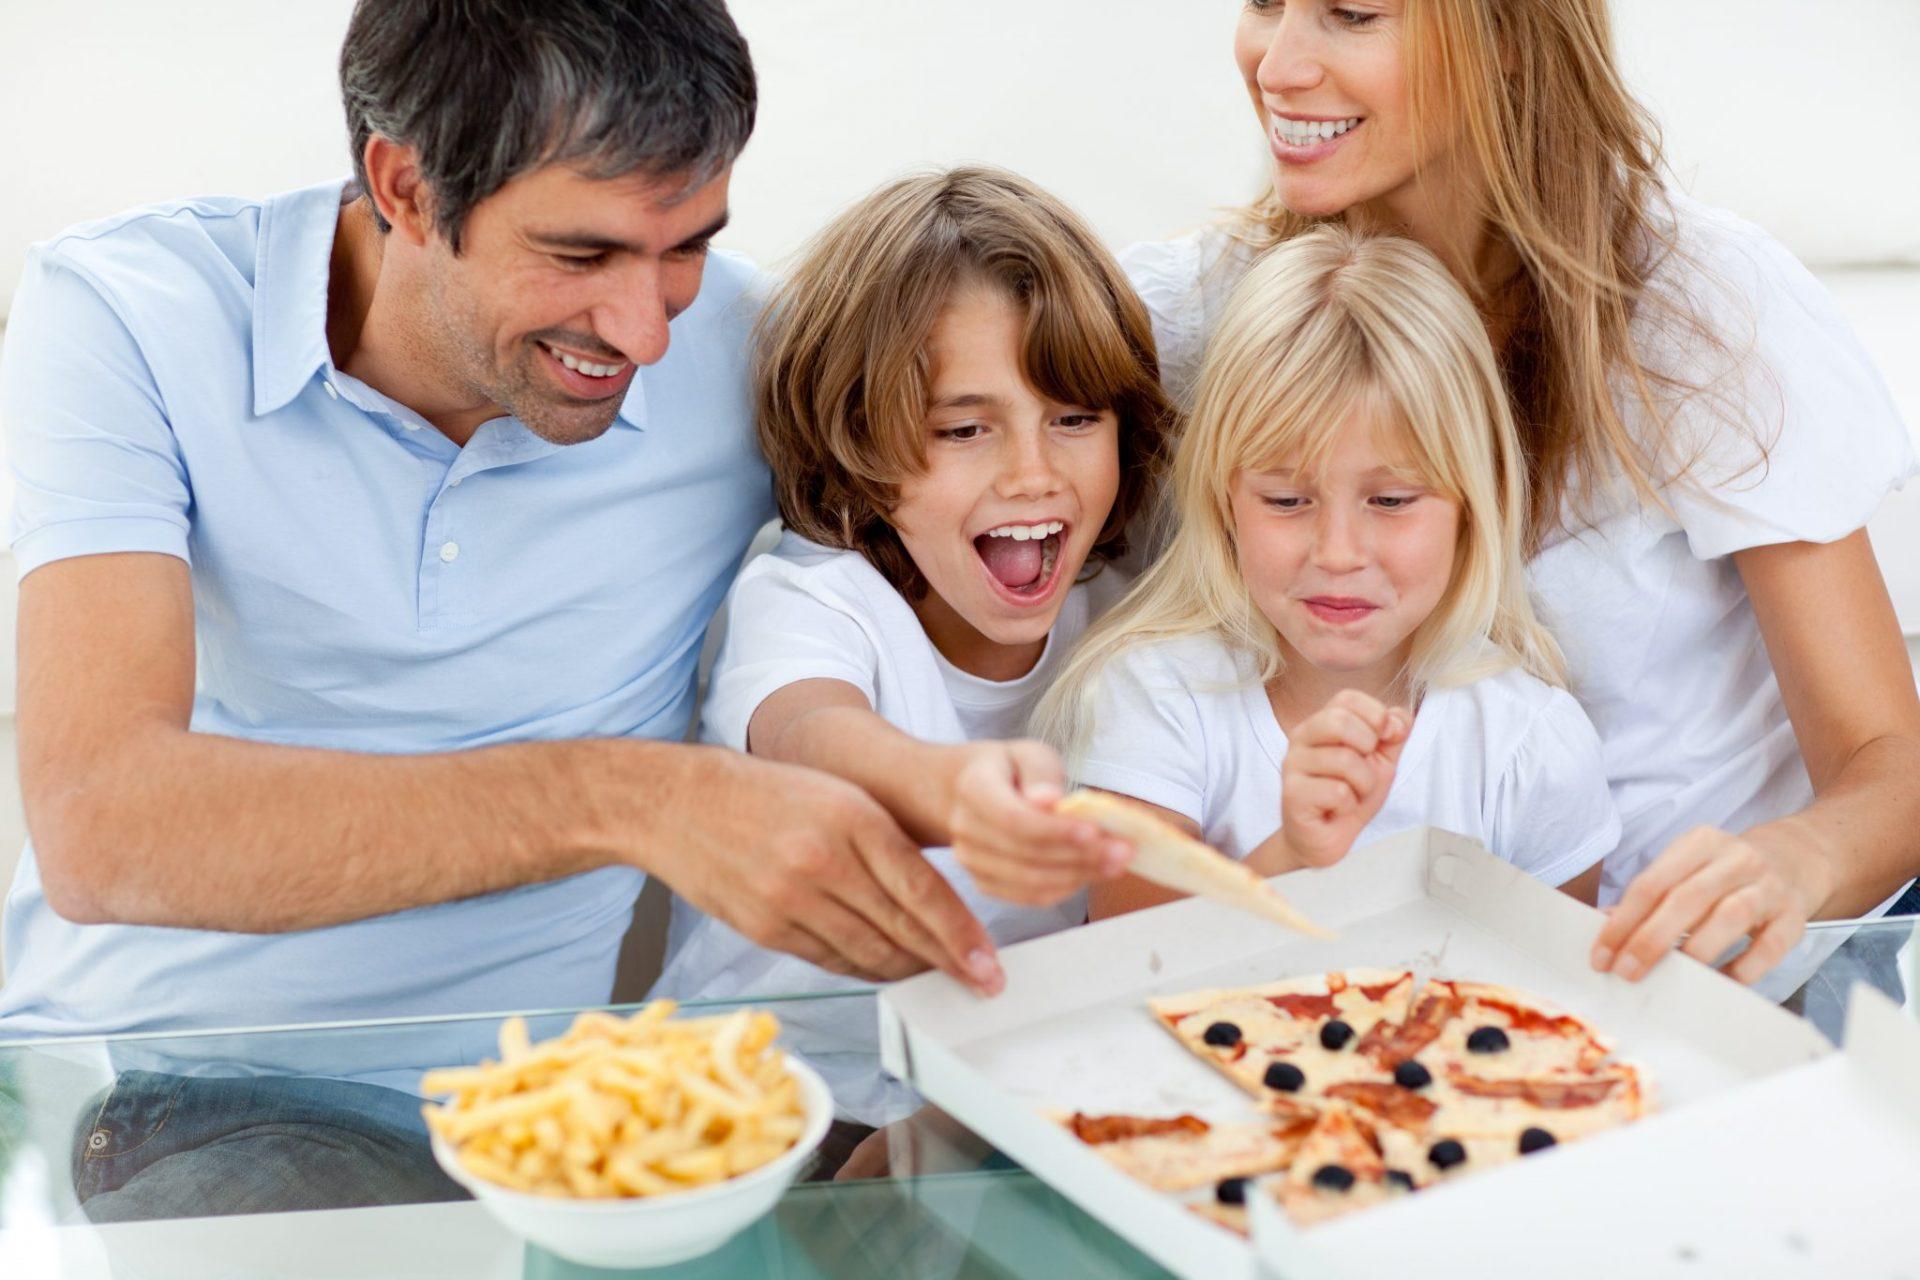 Children Eating Junk Food